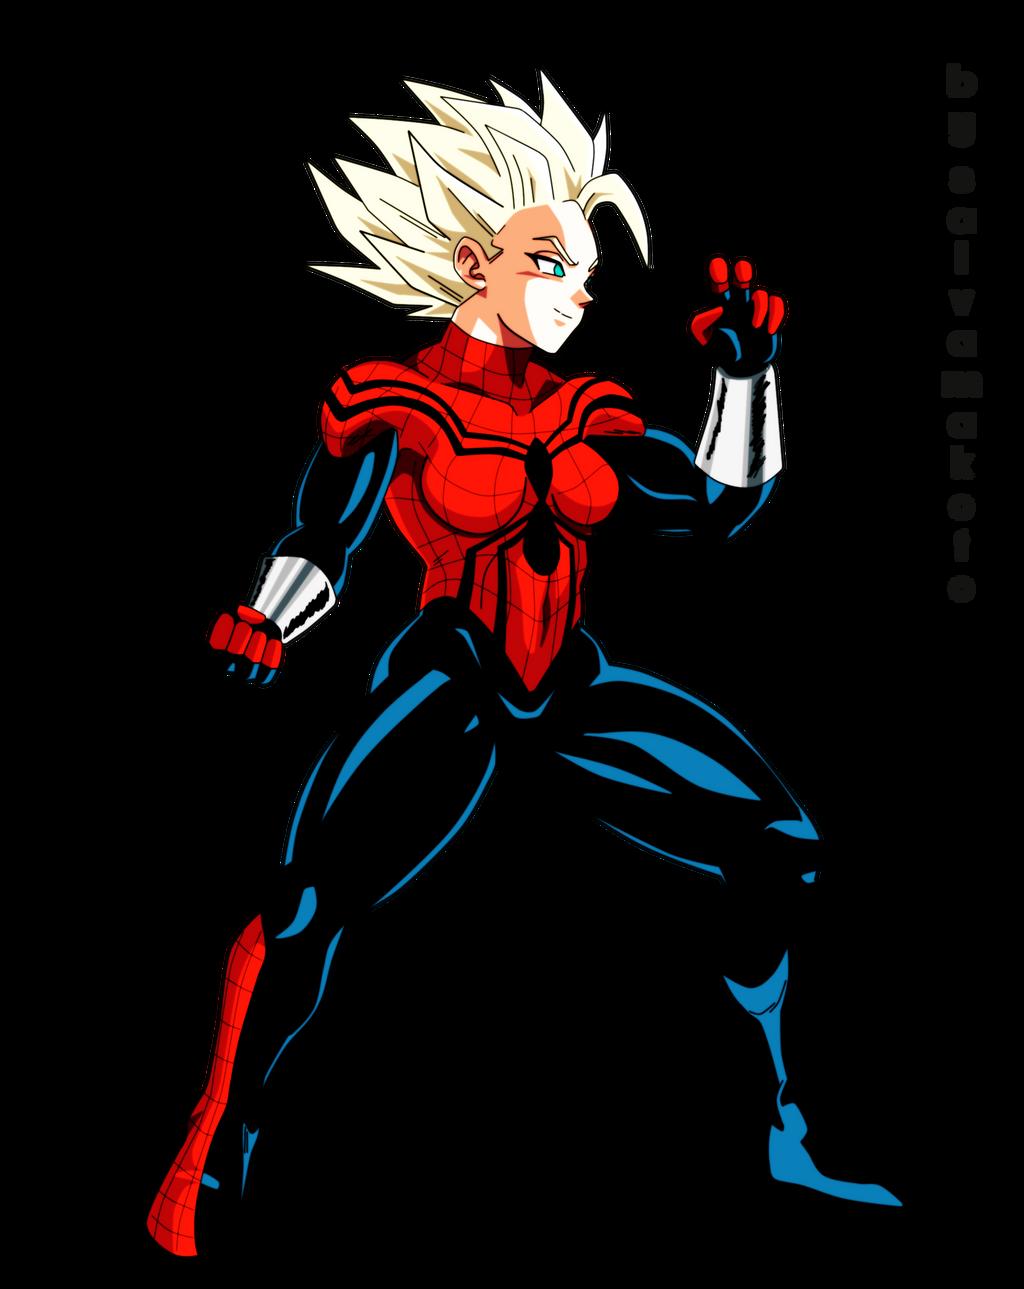 spidergirl saiyajin - commission